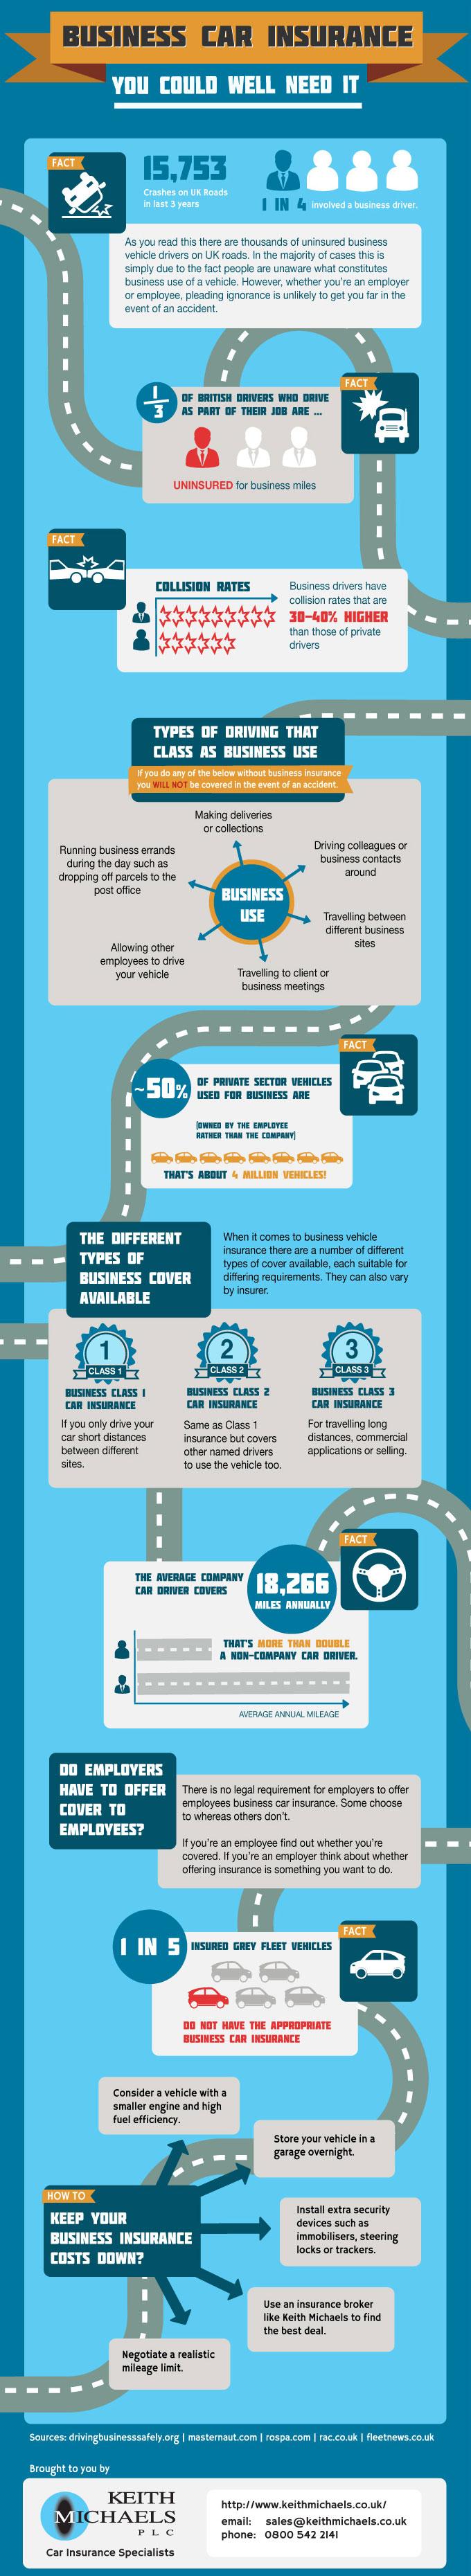 Business Car Insurance Explained